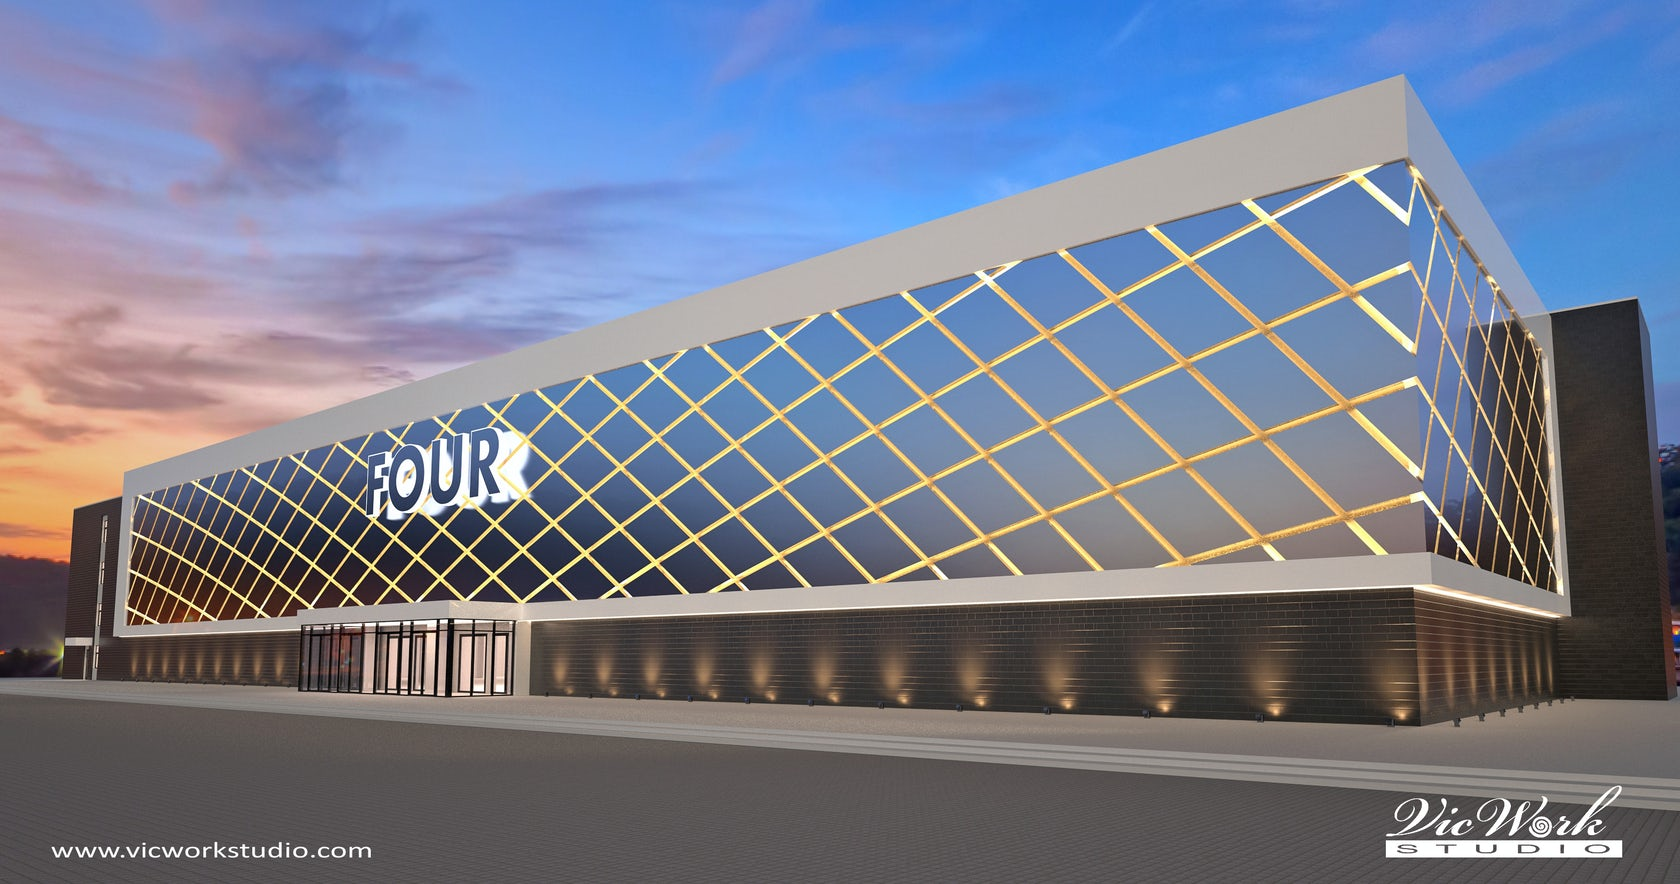 Concept designs of the shopping mall facade architizer